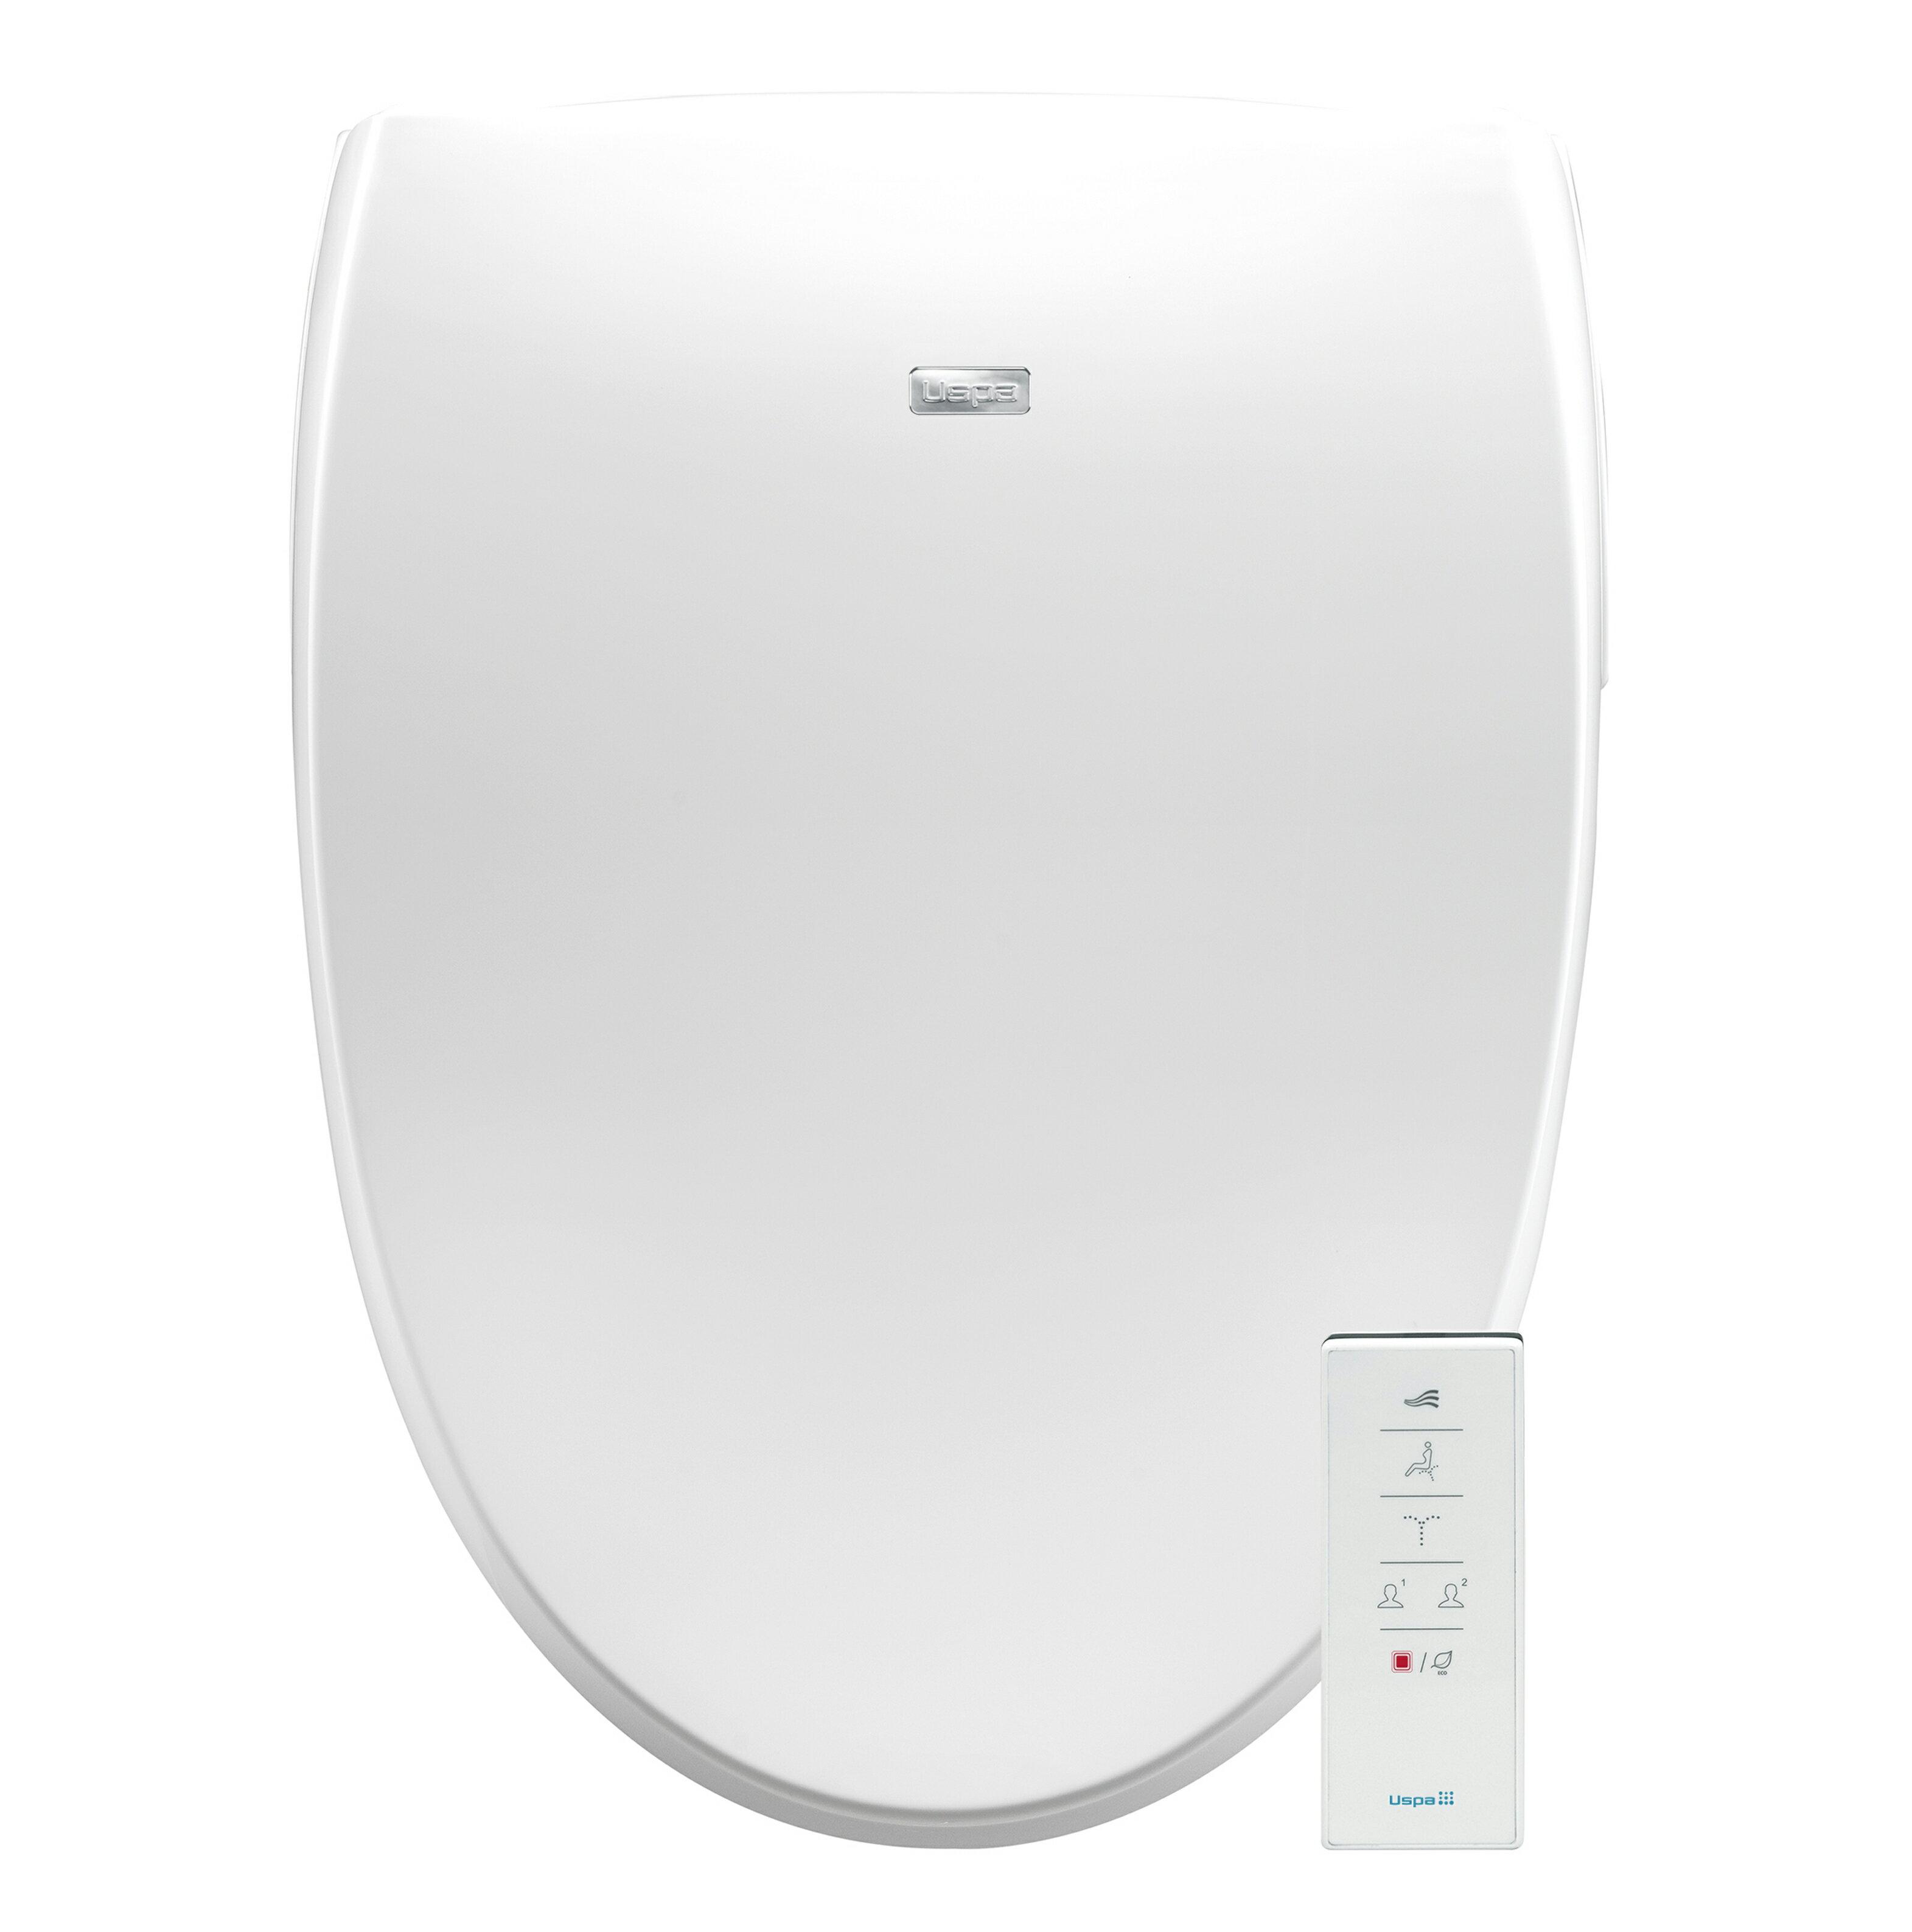 Groovy Bio Bidet A8 Serenity Premier Bidet Smart Toilet Seat In Elongated White With Dual Sided Wireless Remote Machost Co Dining Chair Design Ideas Machostcouk